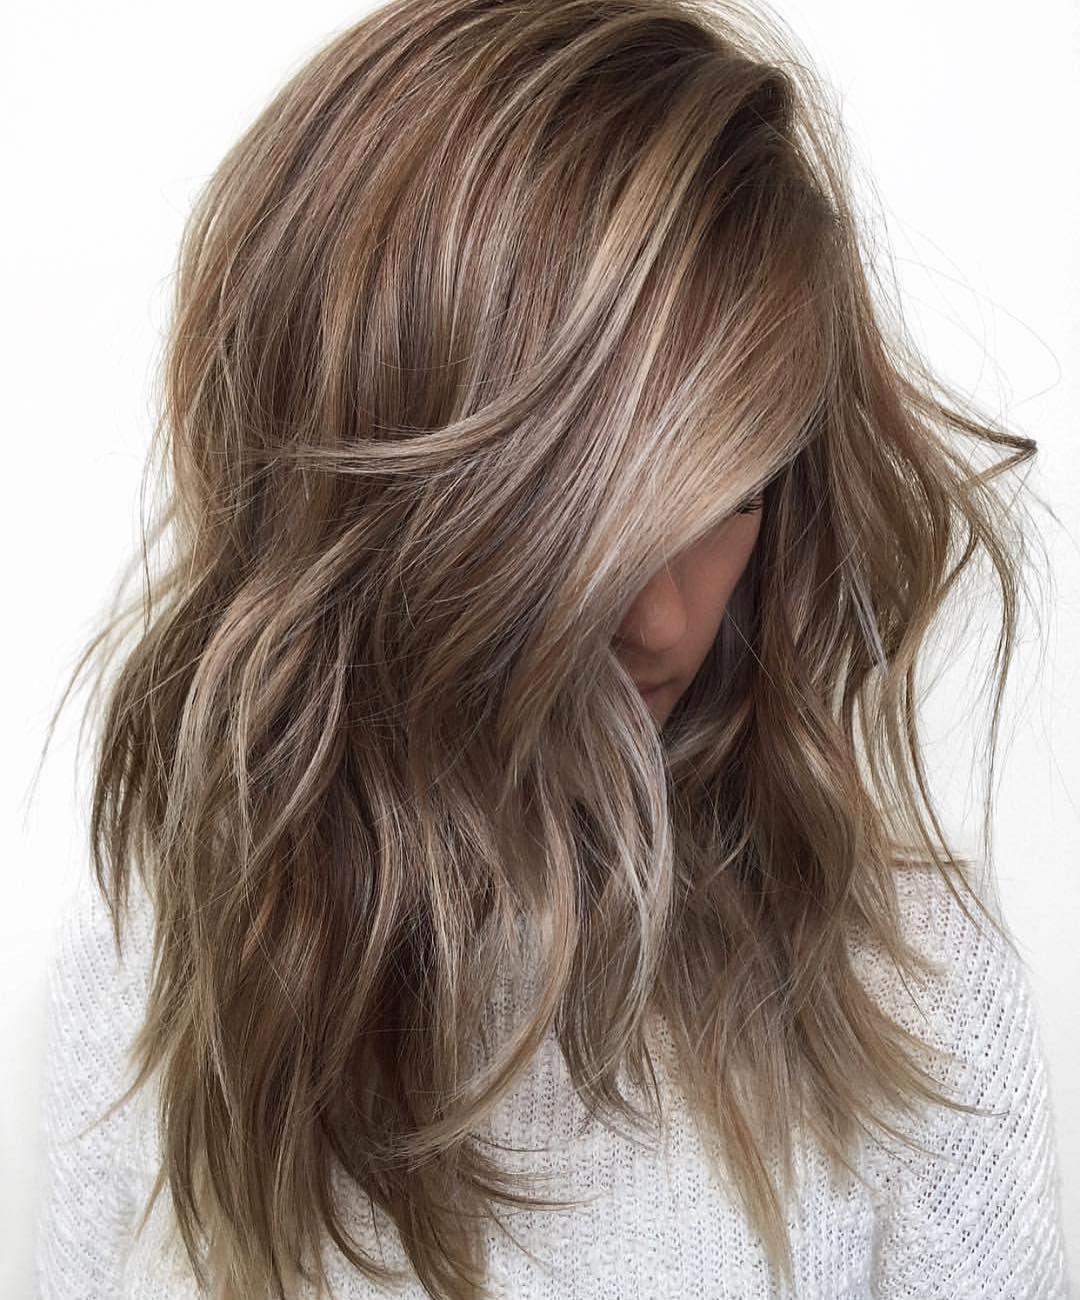 50 Best Hairstyles For Thin Hair In 2017 Hair Styles Dark Blonde Hair Color Long Hair Styles